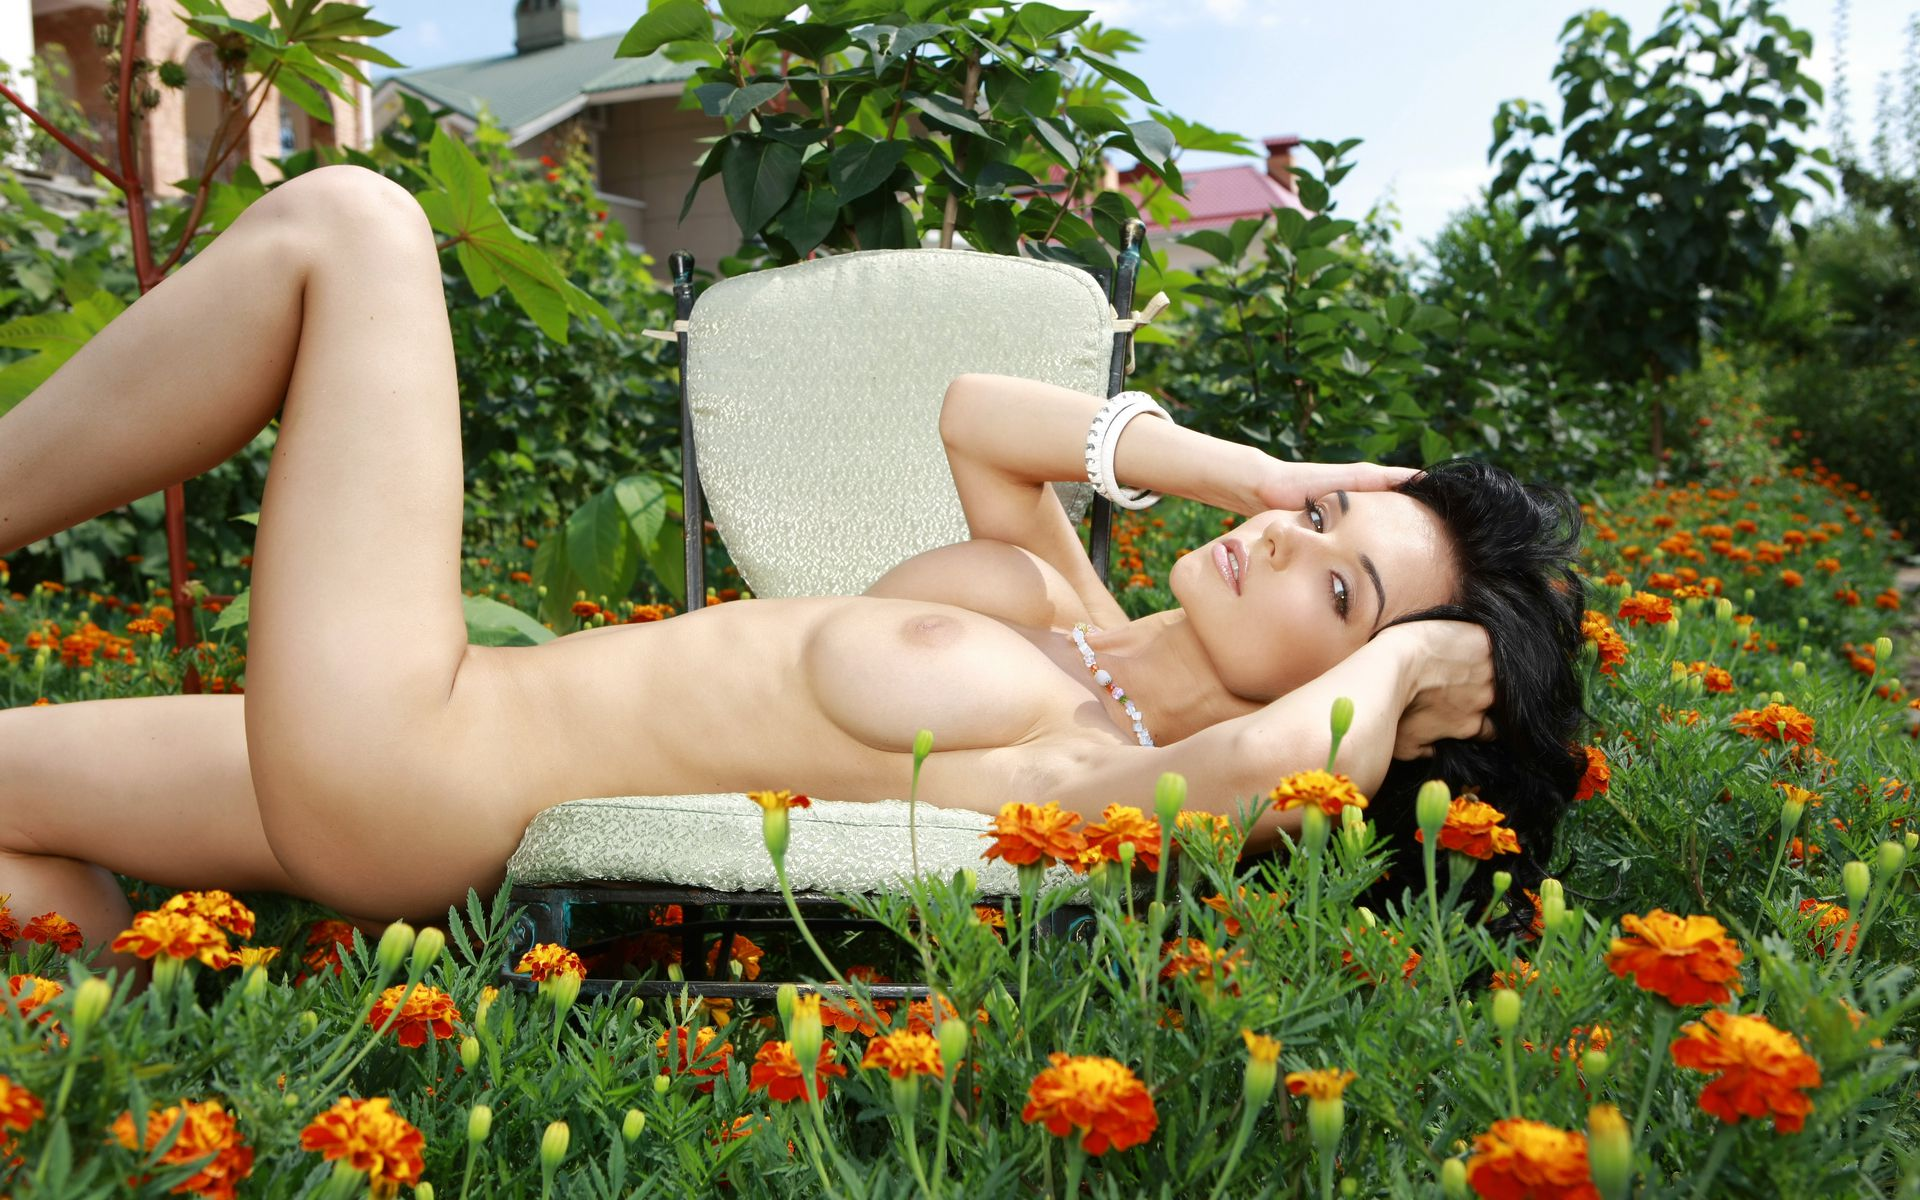 seks-v-tsvetah-foto